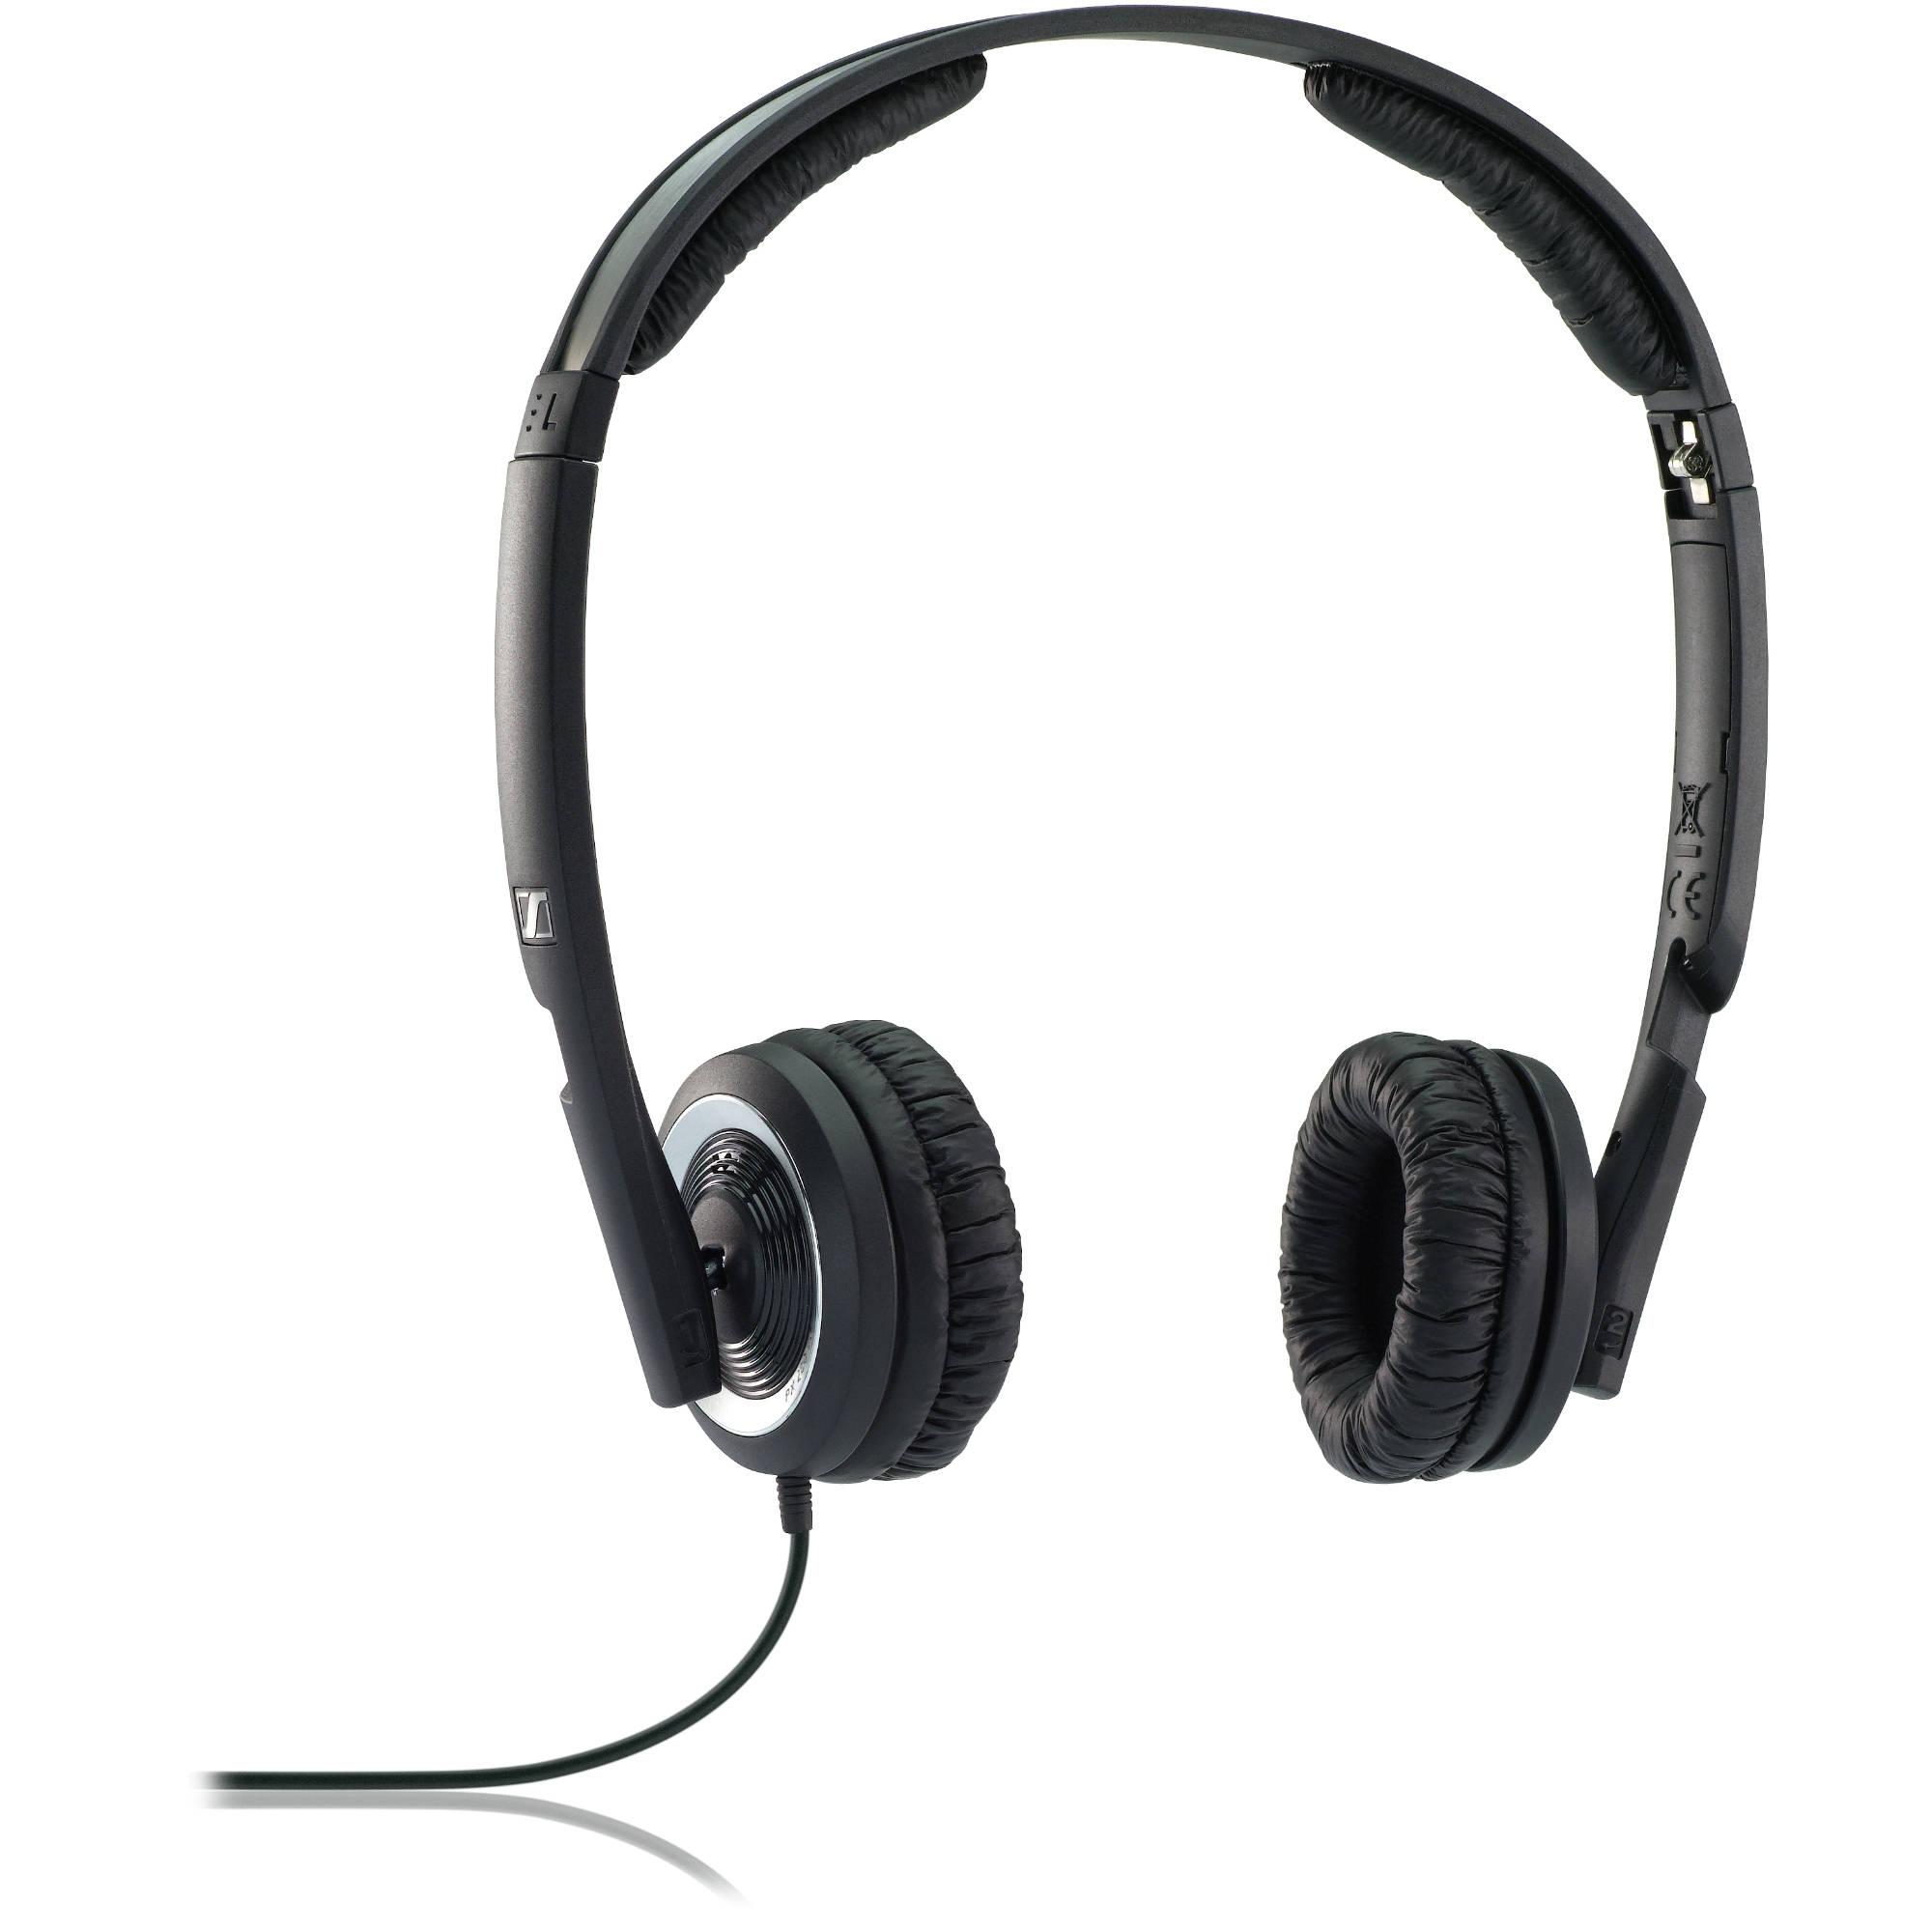 Sennheiser Px 200 Ii On Ear Stereo Headphones Black Px200 Hd 800 Dynamic Headphone